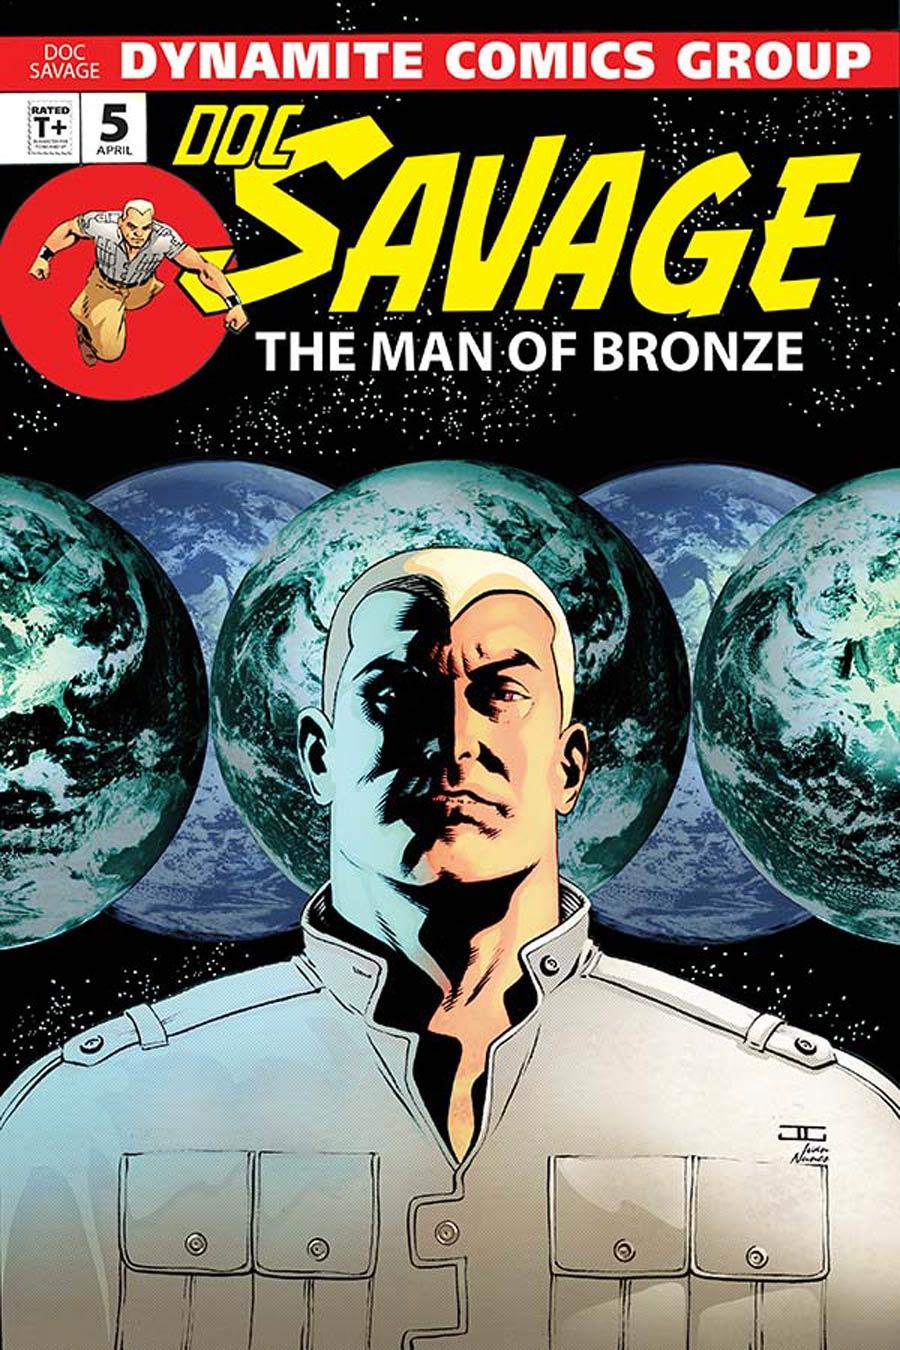 Doc Savage Vol 5 #5 Cover B Variant John Cassaday VIP Cover